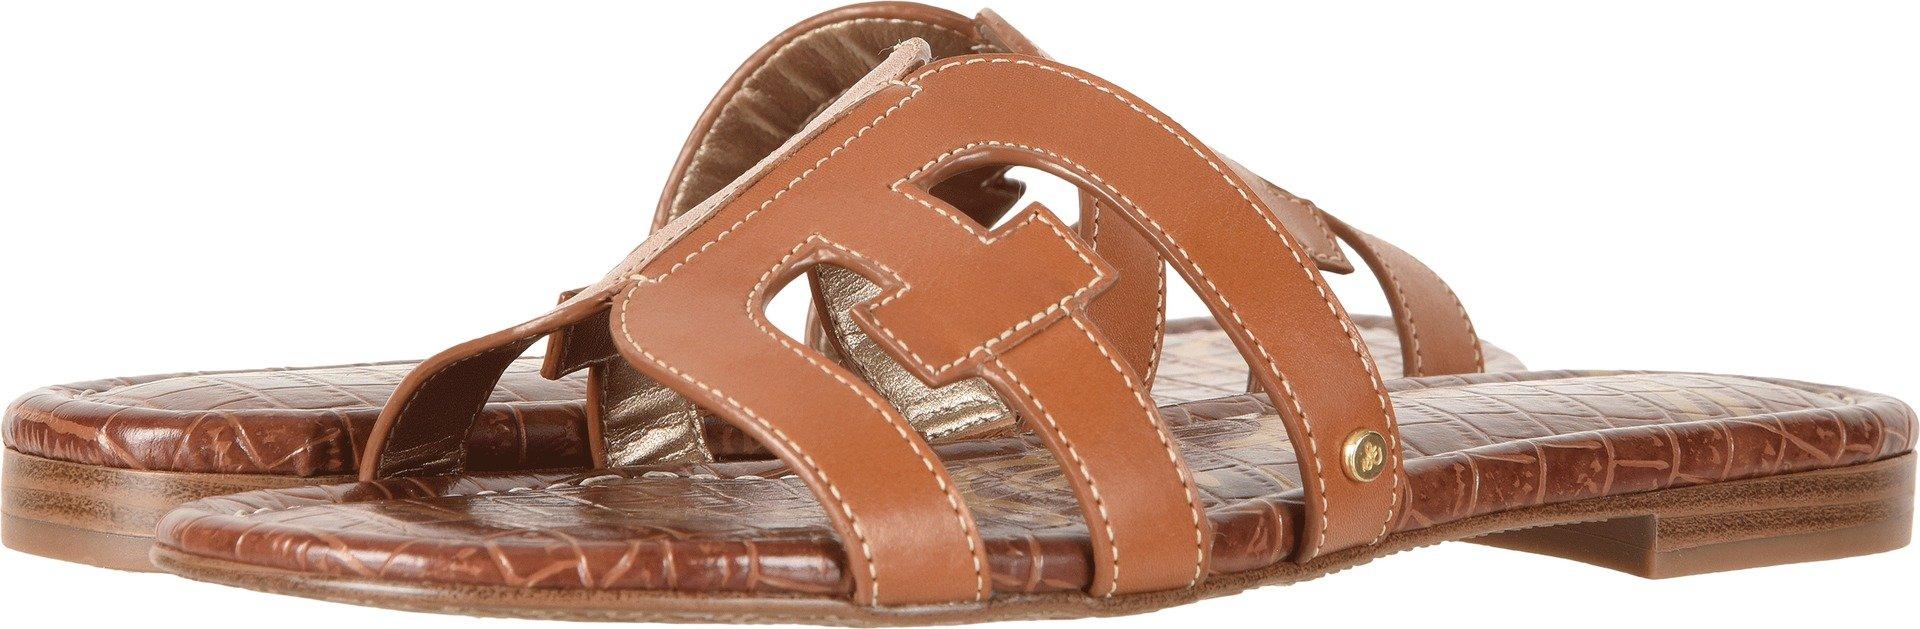 Sam Edelman Women's Bay Slide Sandal, Saddle Leather, 8 M US